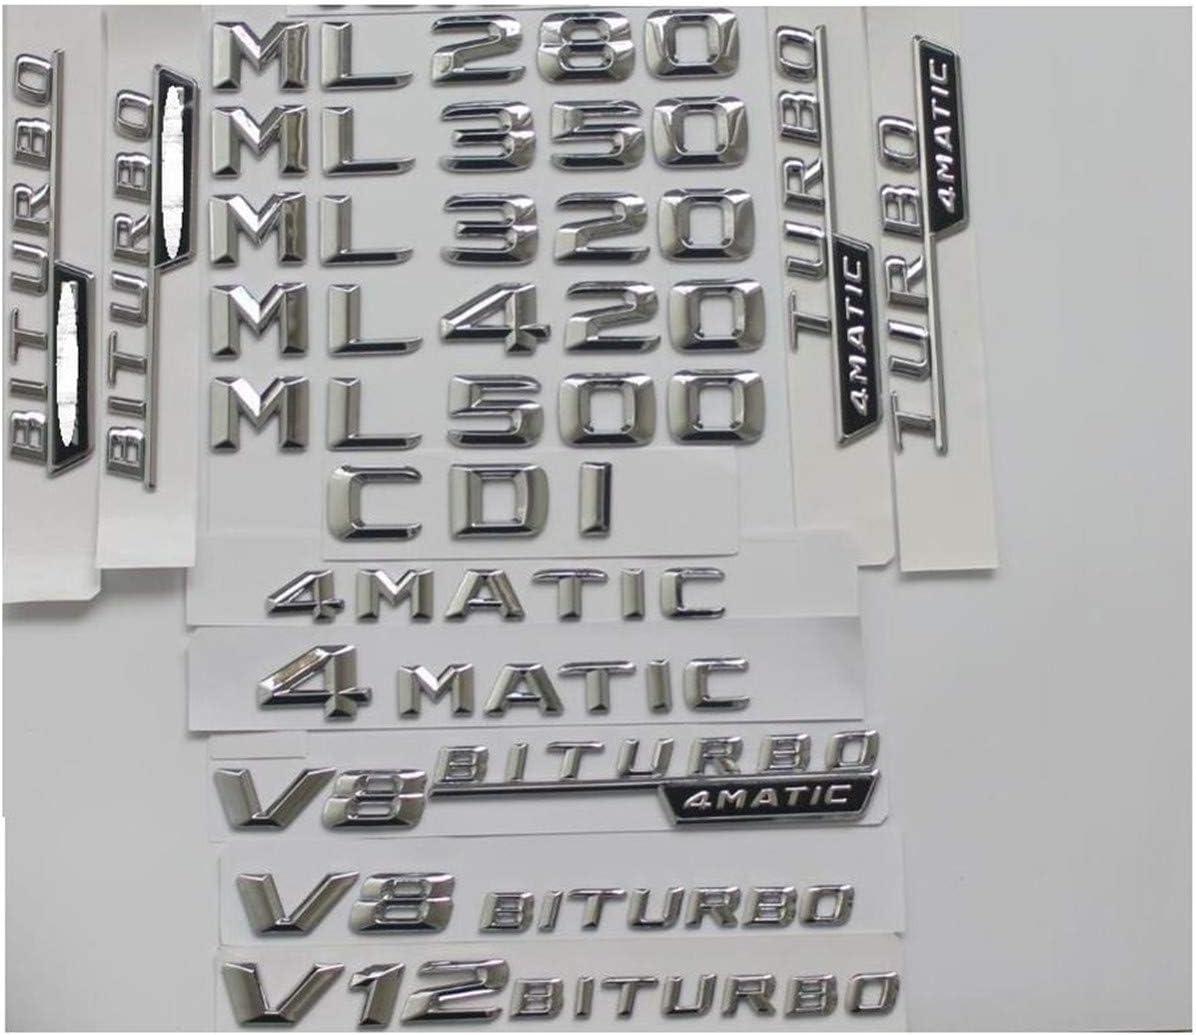 Chrome Super-cheap Trunk Letters Badge Emblem Emblems Mercedes Benz Cheap SALE Start ML55 for